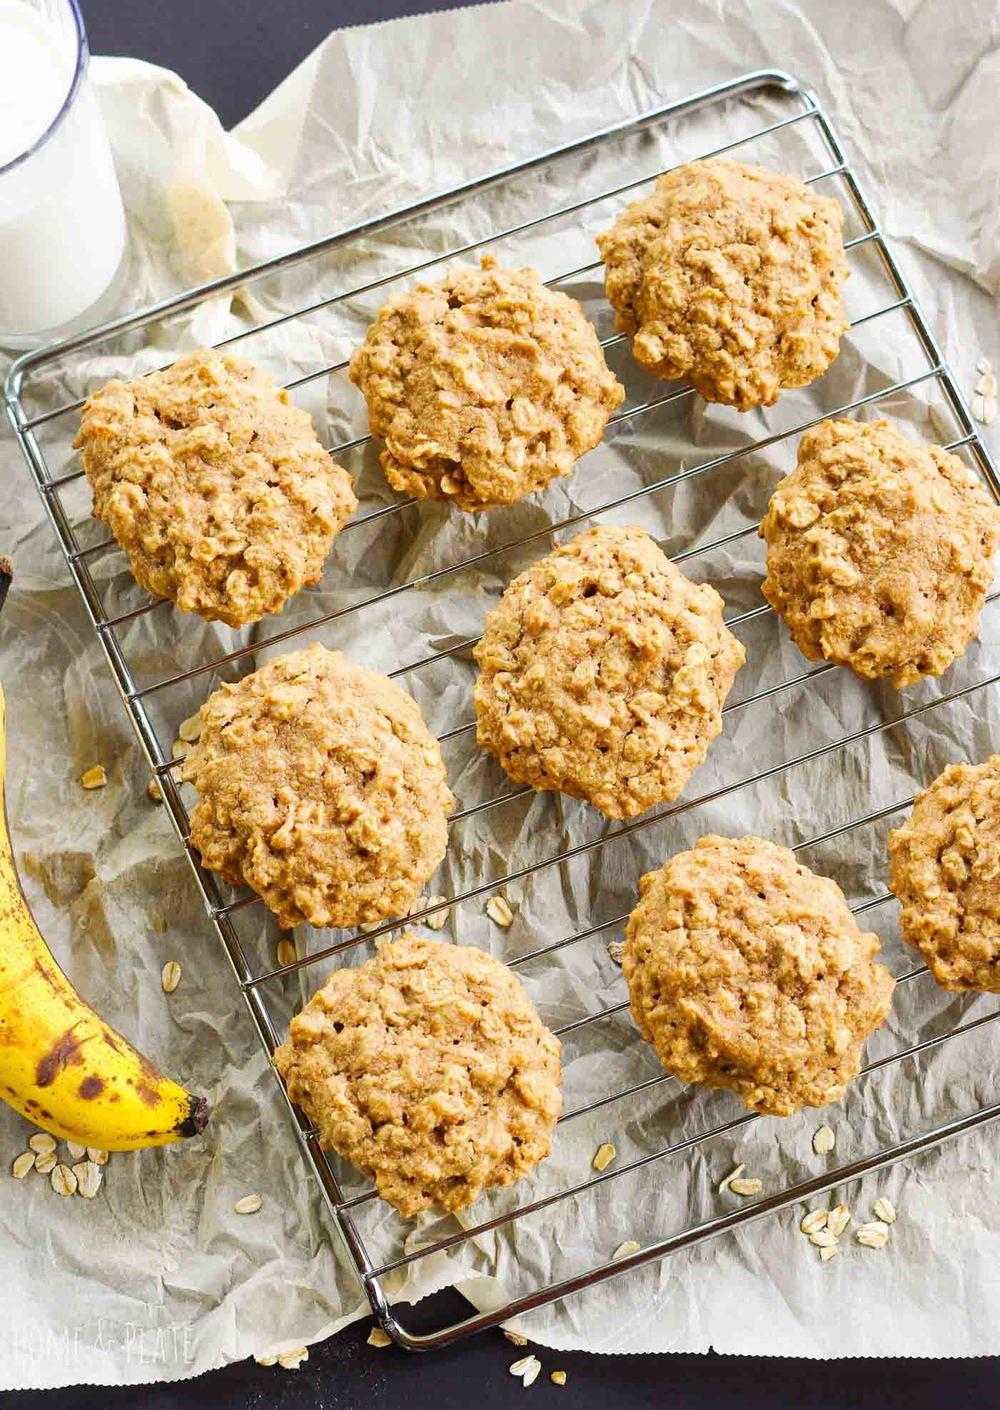 Healthy Peanut Butter Banana Cookies